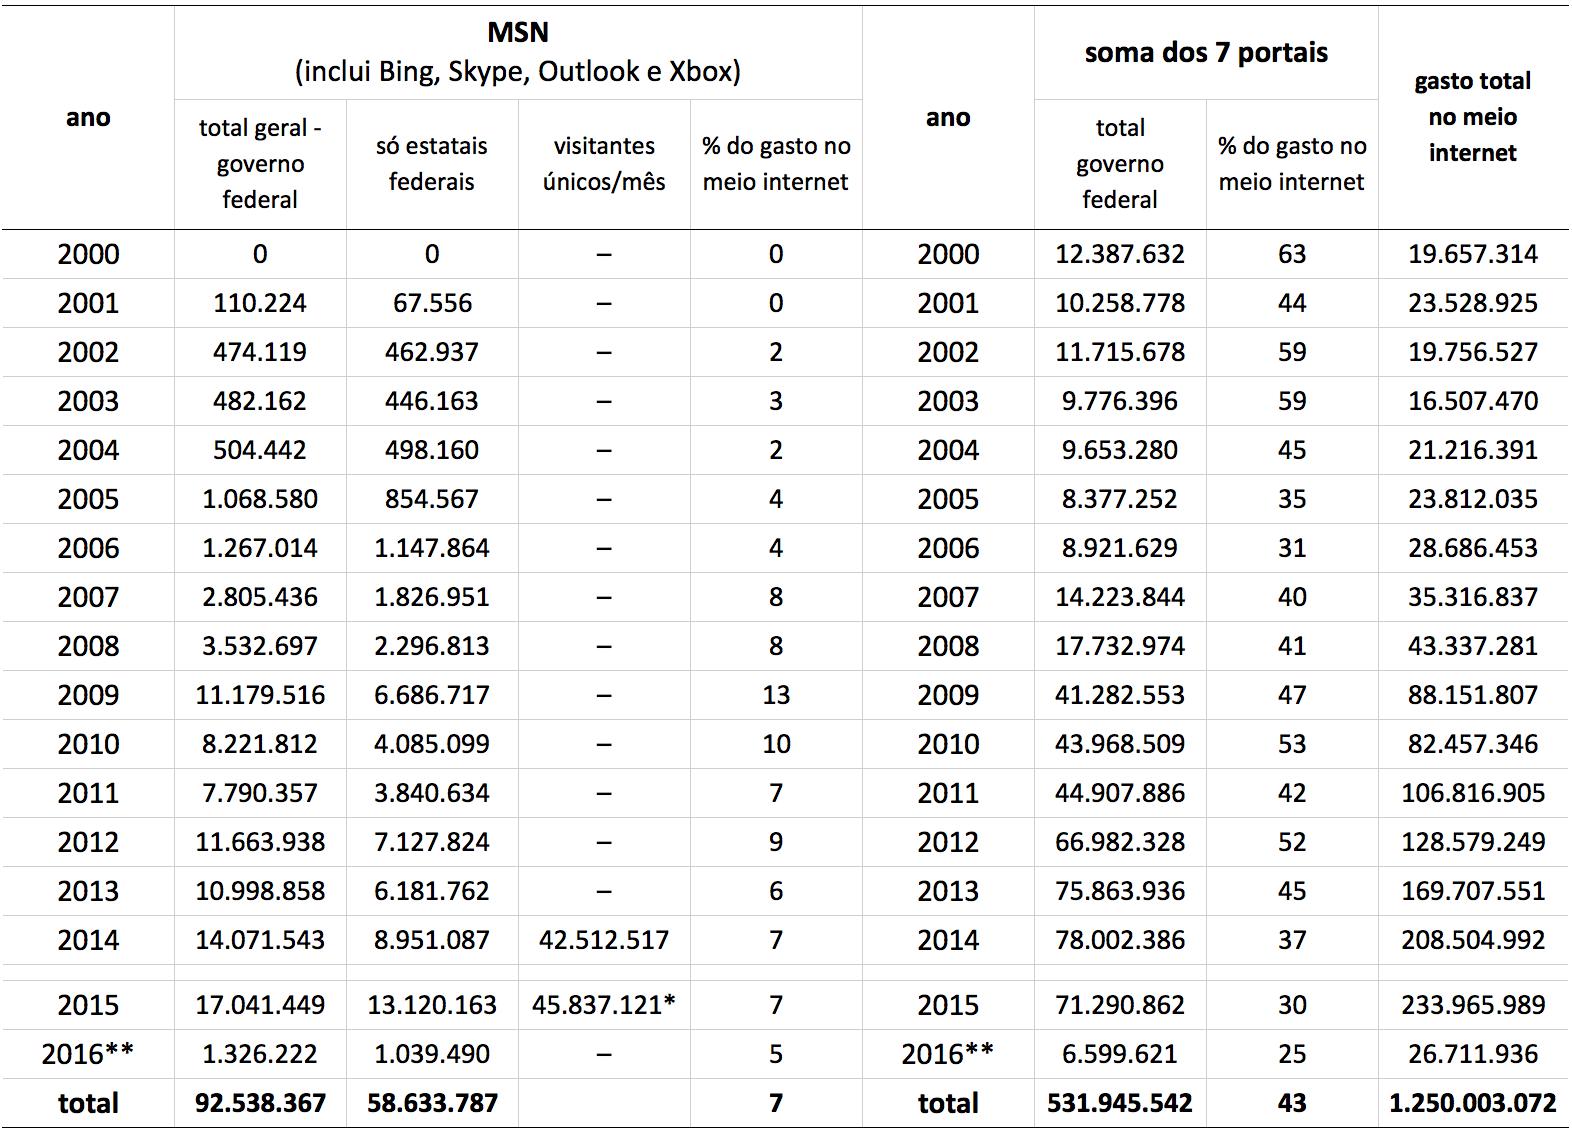 Quanto Custa O Oligopolio Midiatico Carta Maior